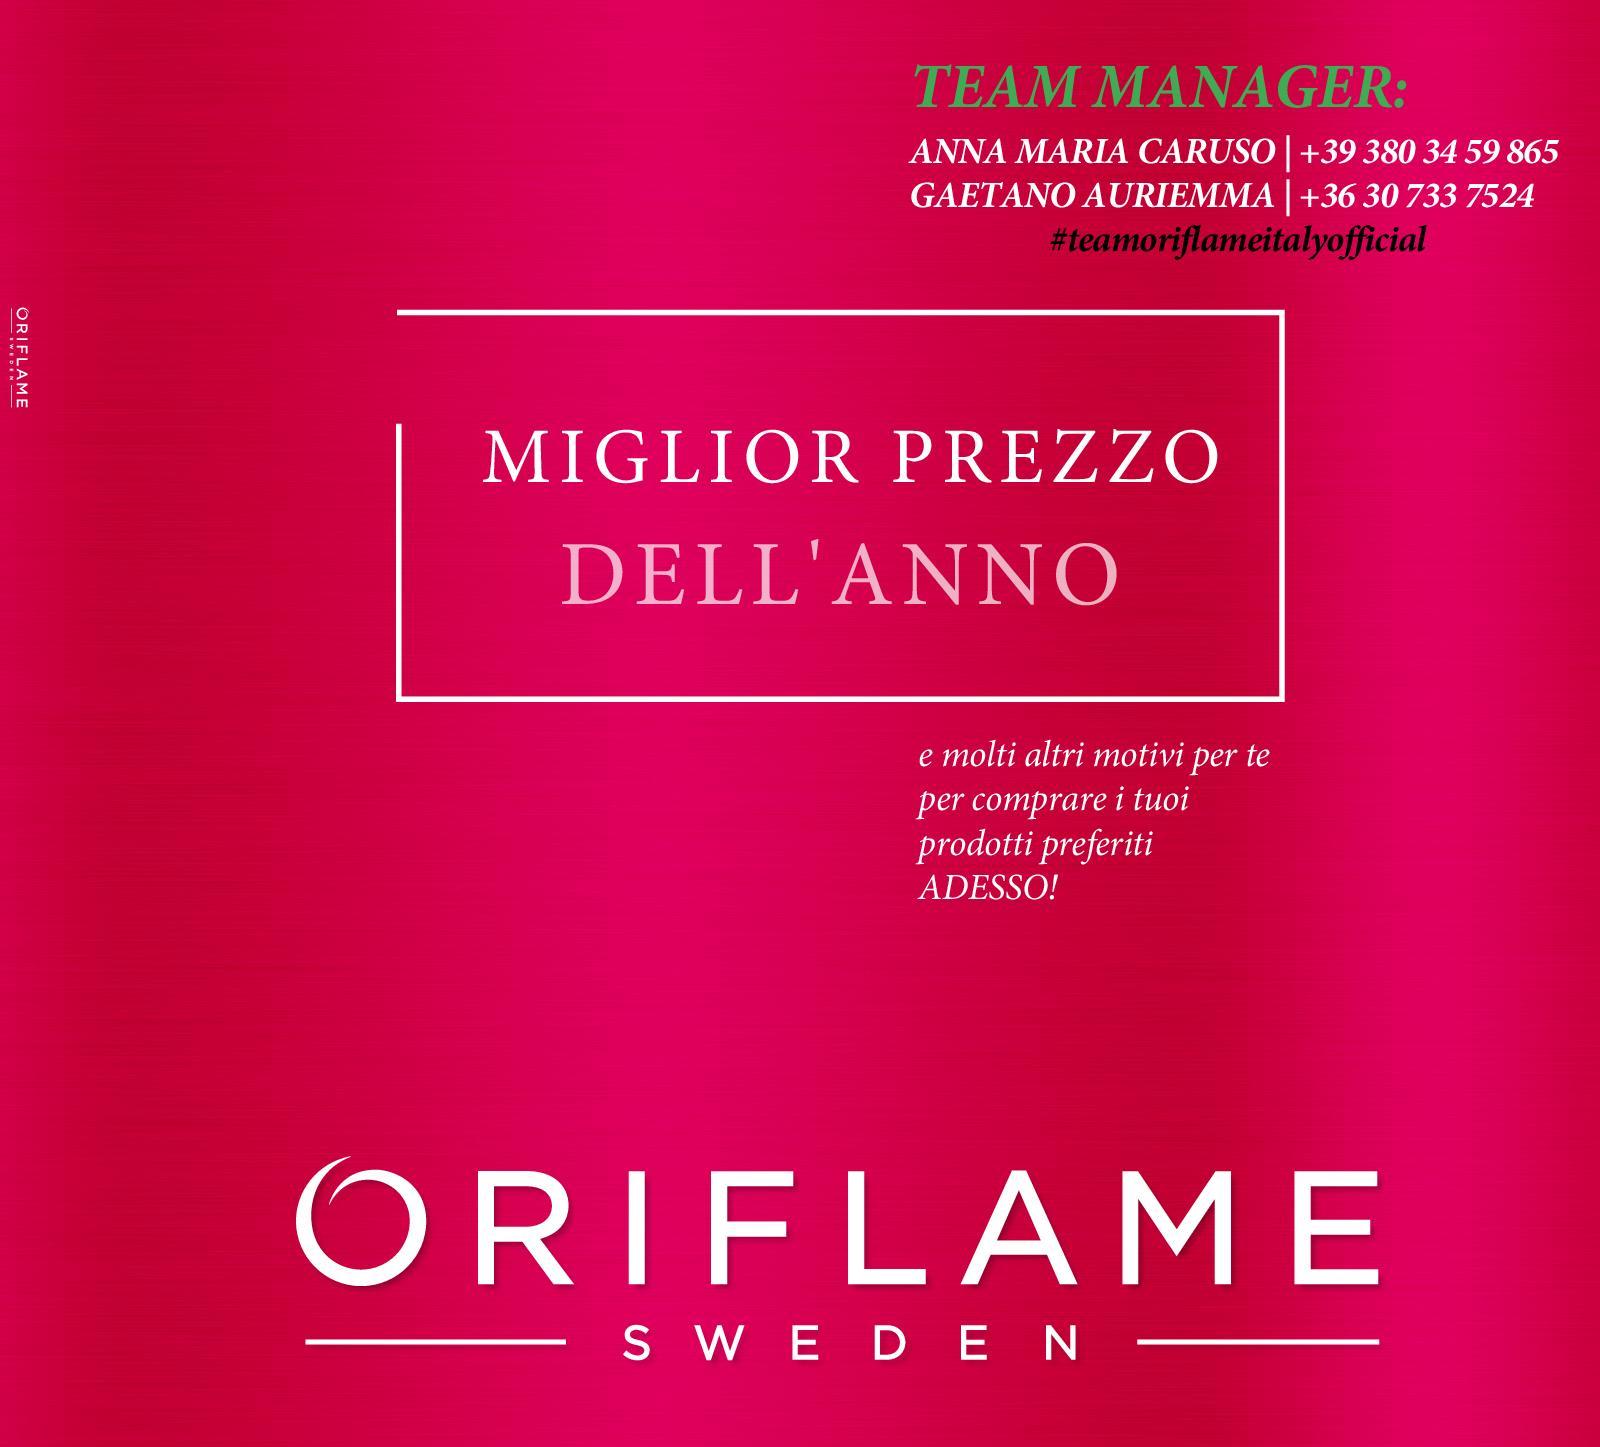 4c8b278c55d4 Catalogo Oriflame Ita 11 2018 - CALAMEO Downloader